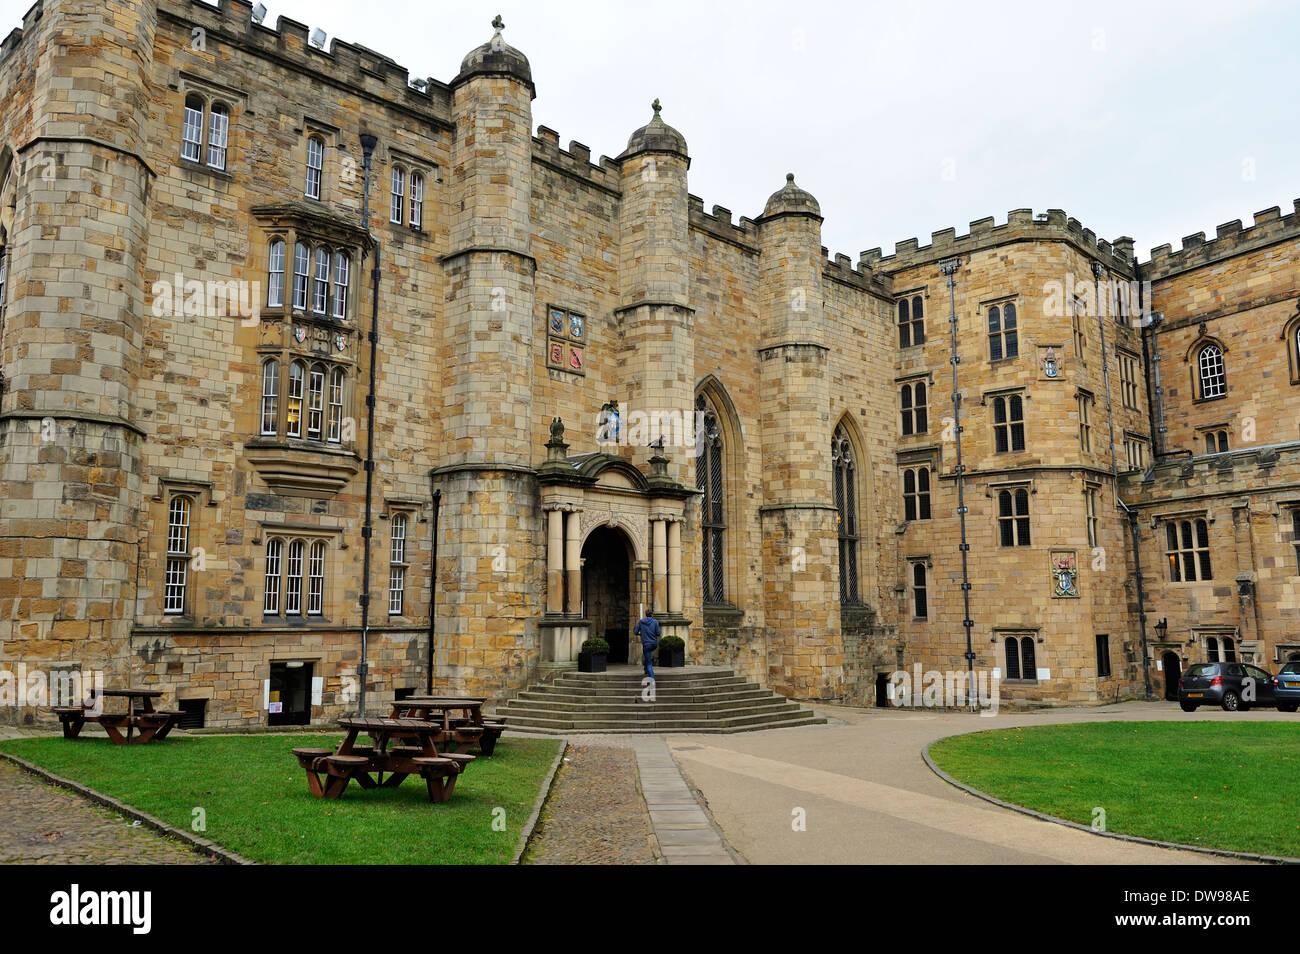 Courtyard of Durham Castle (University College Durham) County Durham, England - Stock Image